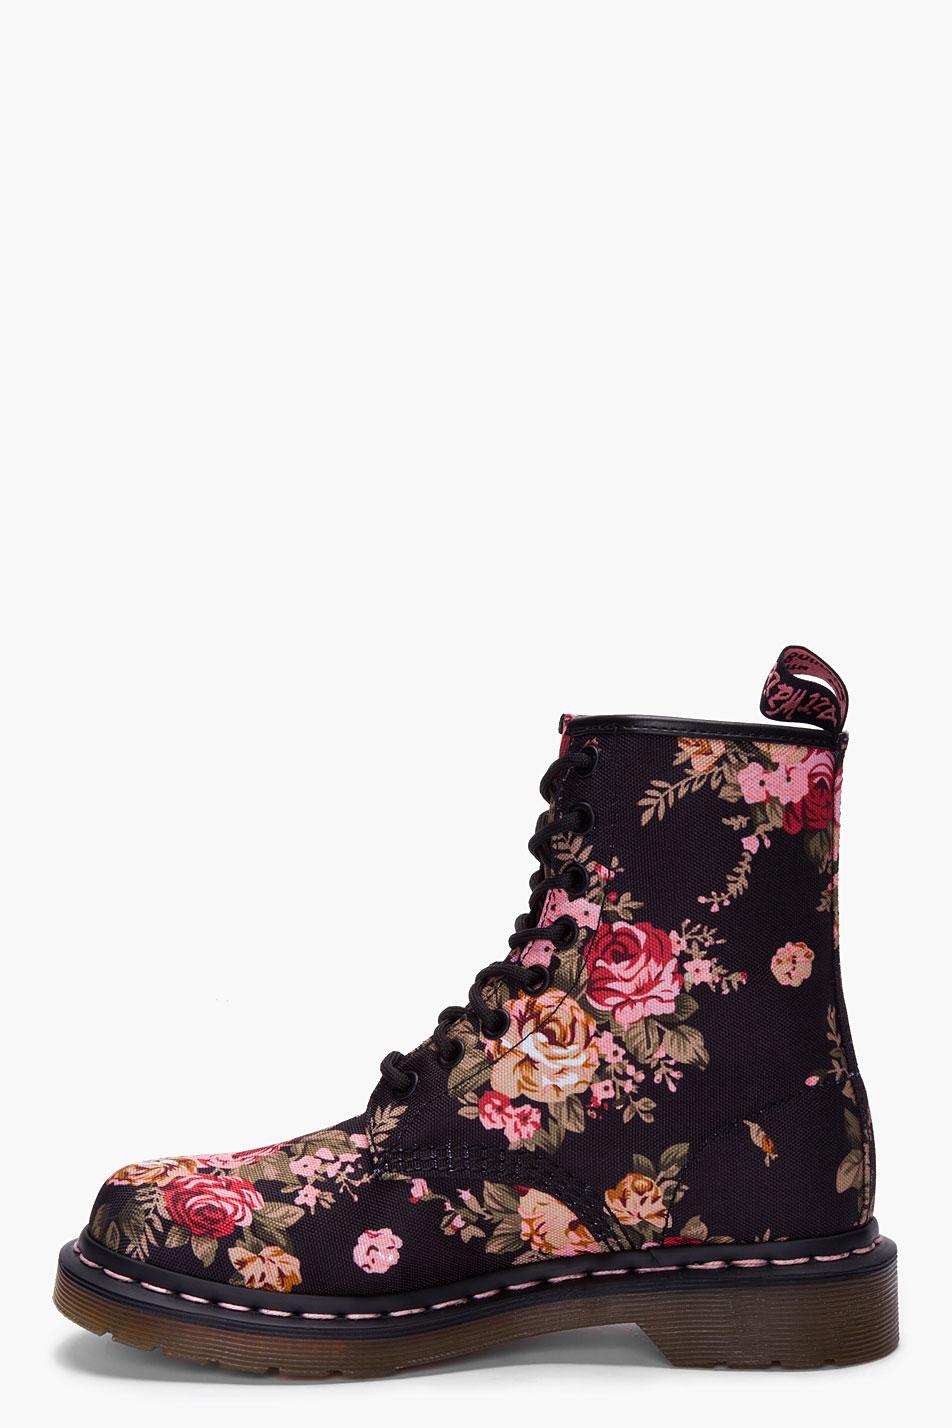 Dr Martens Dr Martens 8 Eye Victorian Print Ankle Boots